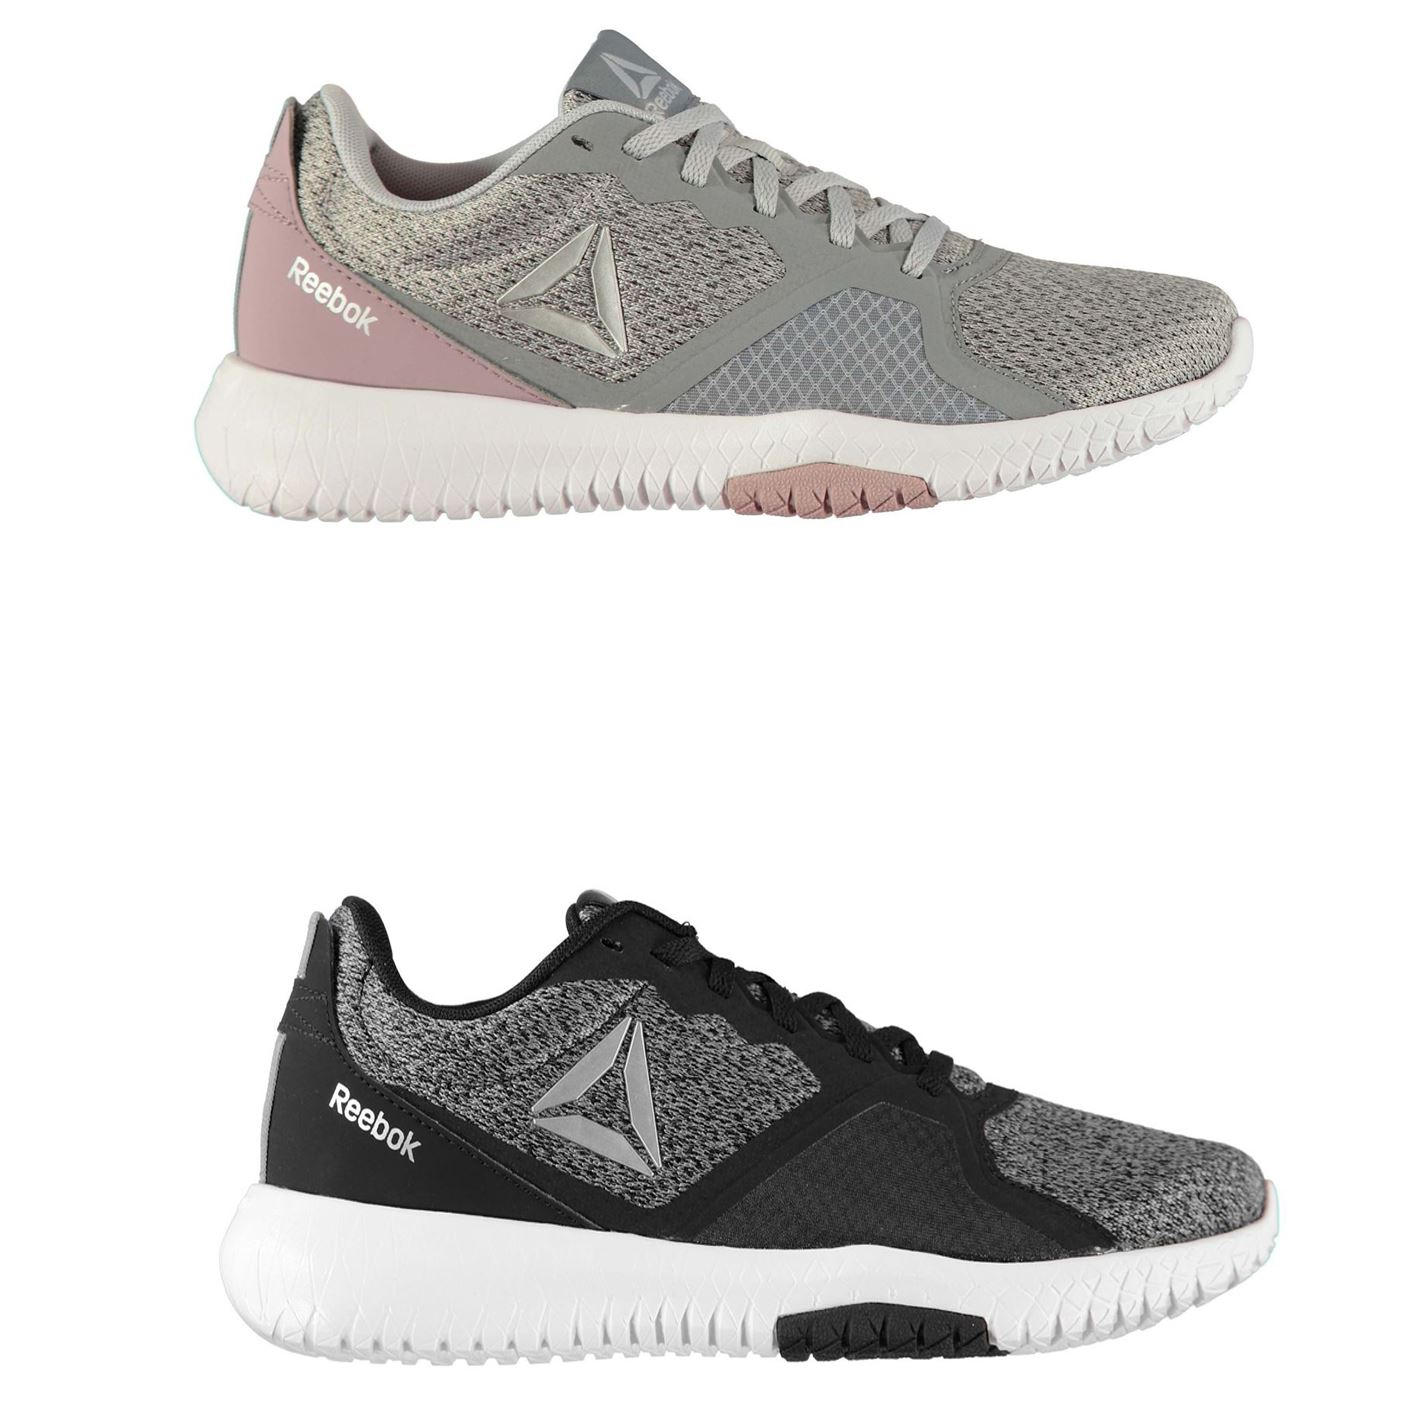 Reebok Flexagon Force Womens Trainers Shoes Ladies Fitness